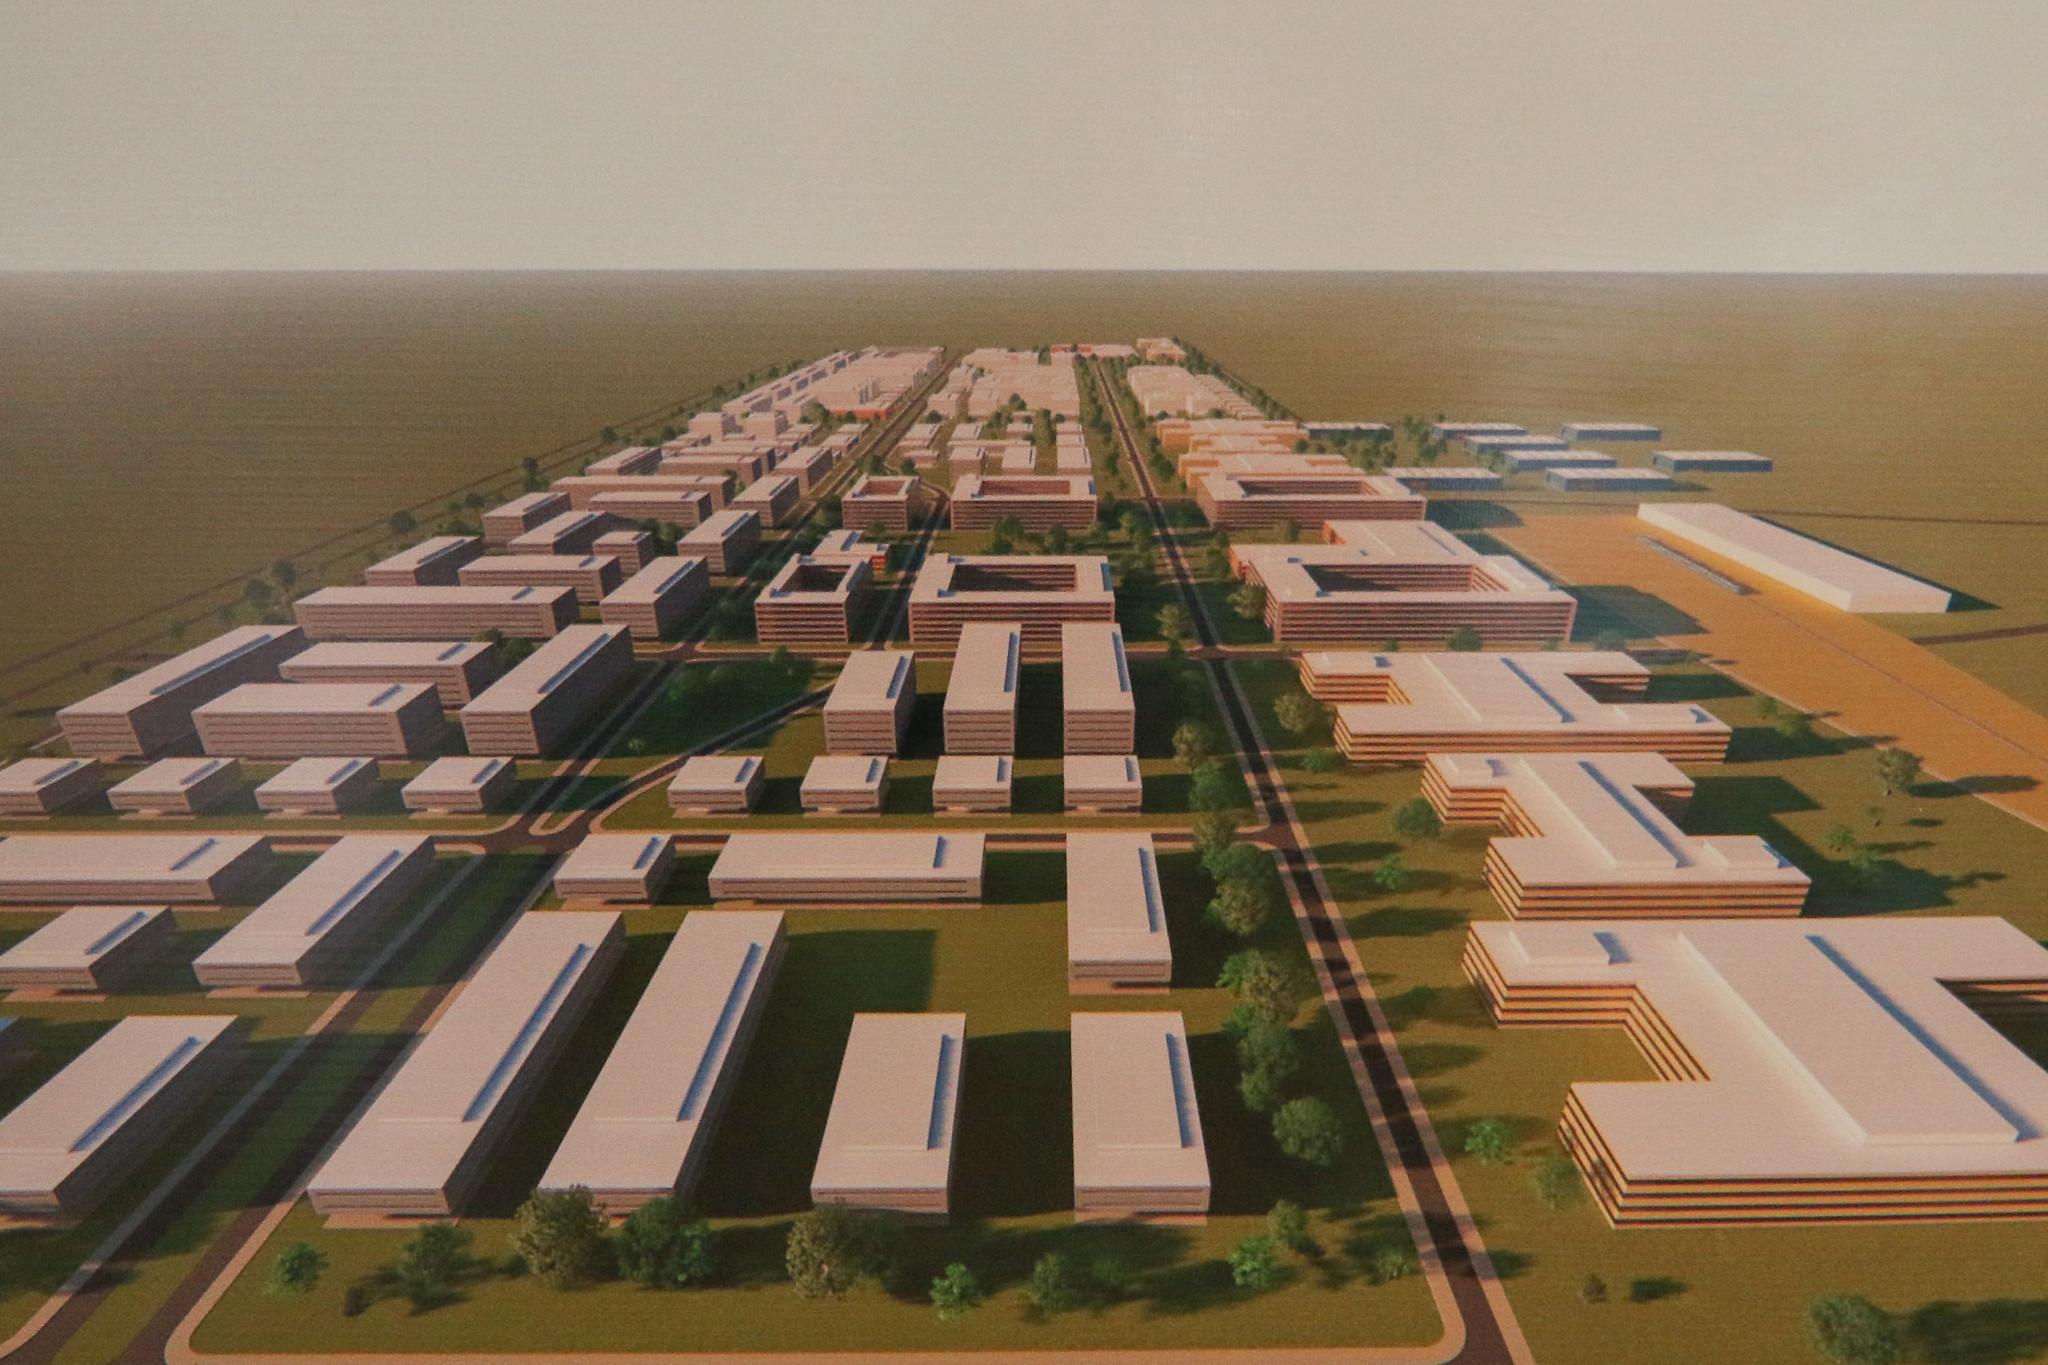 novo bairro residencial de Brasília